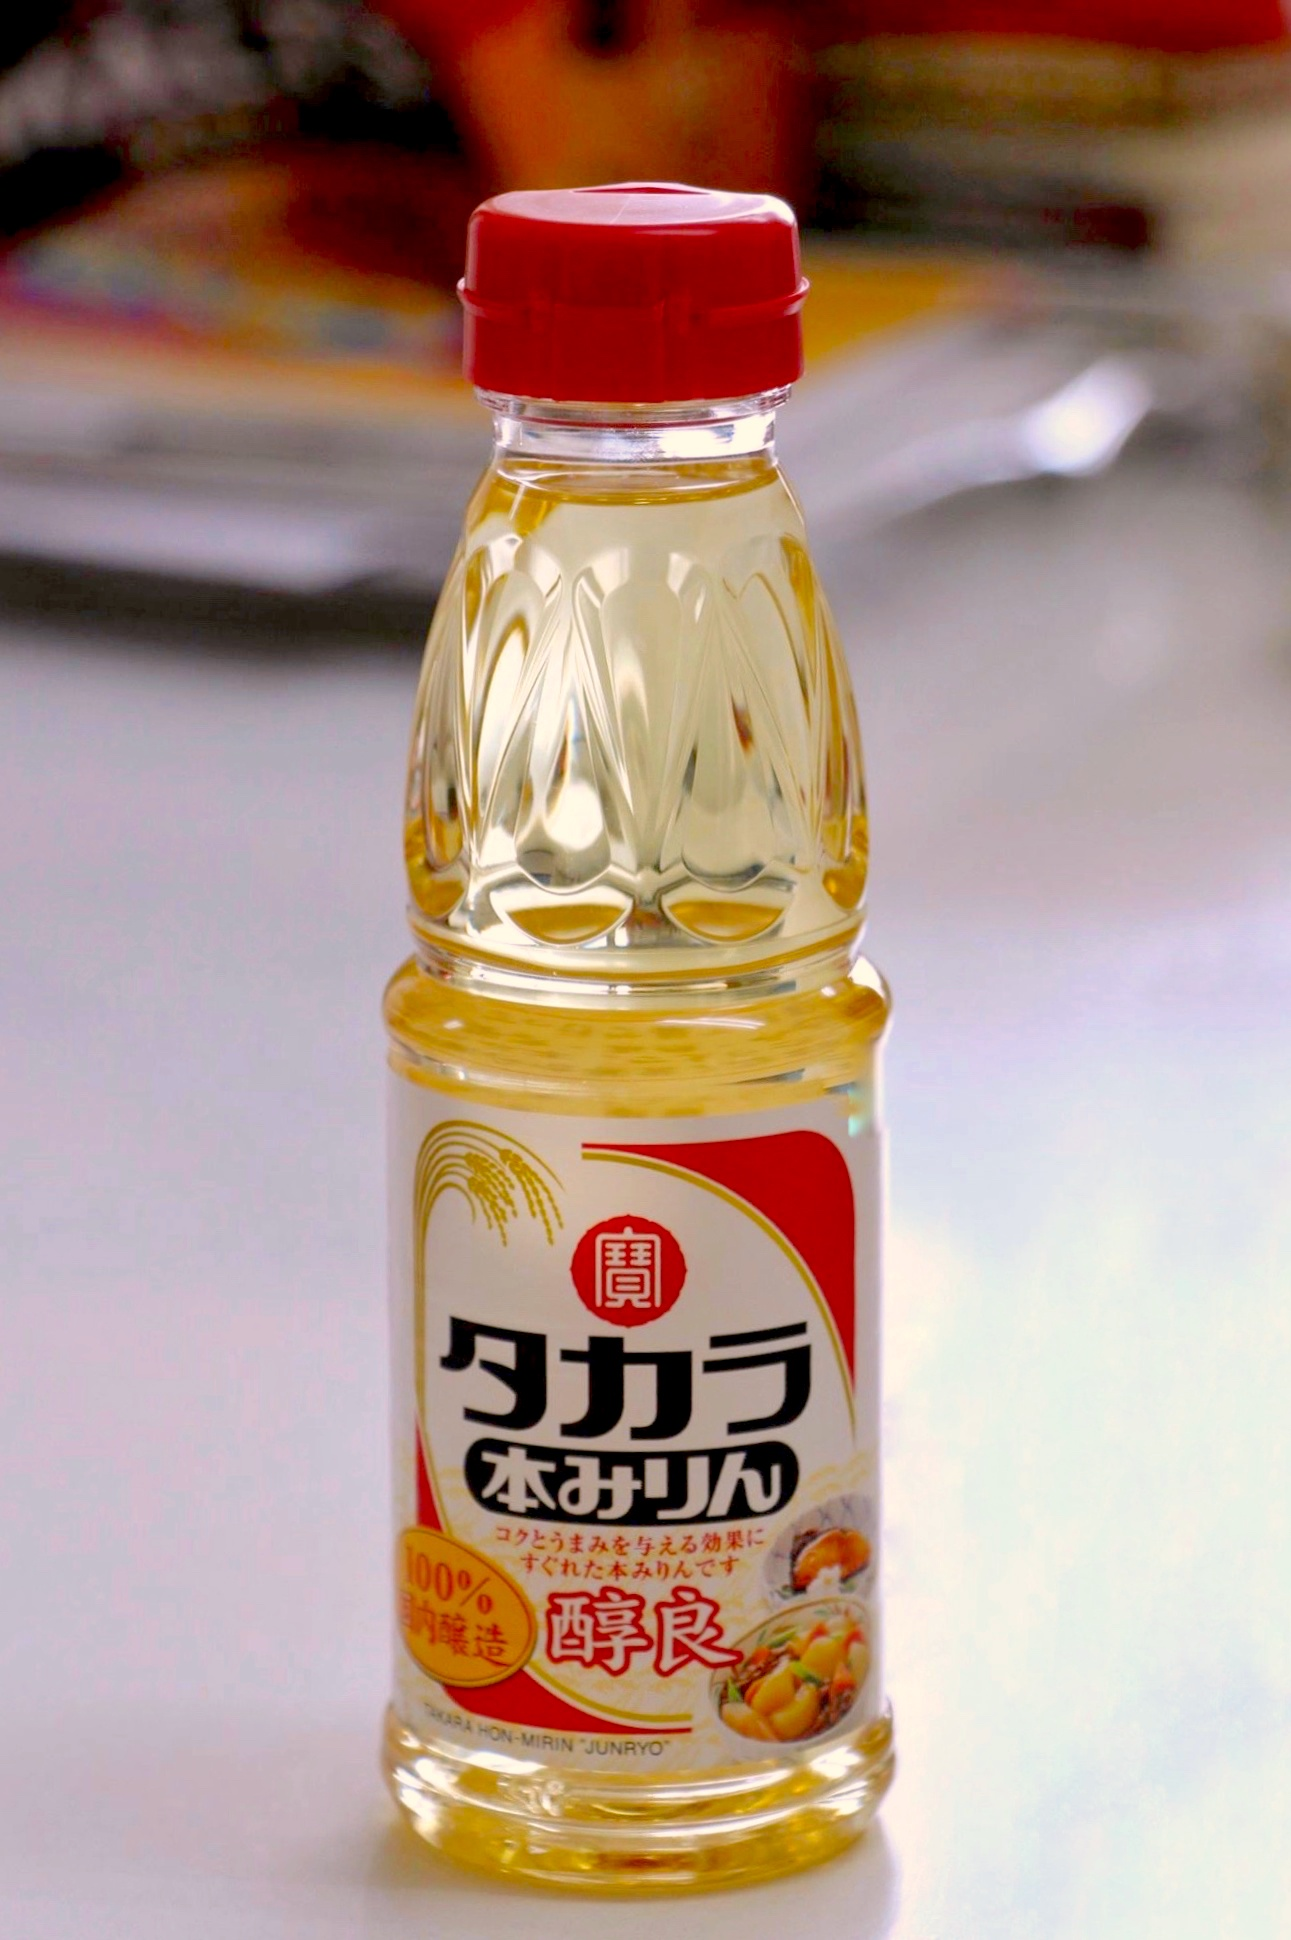 Mirin ©Yuji Ito Cuisine japonaise